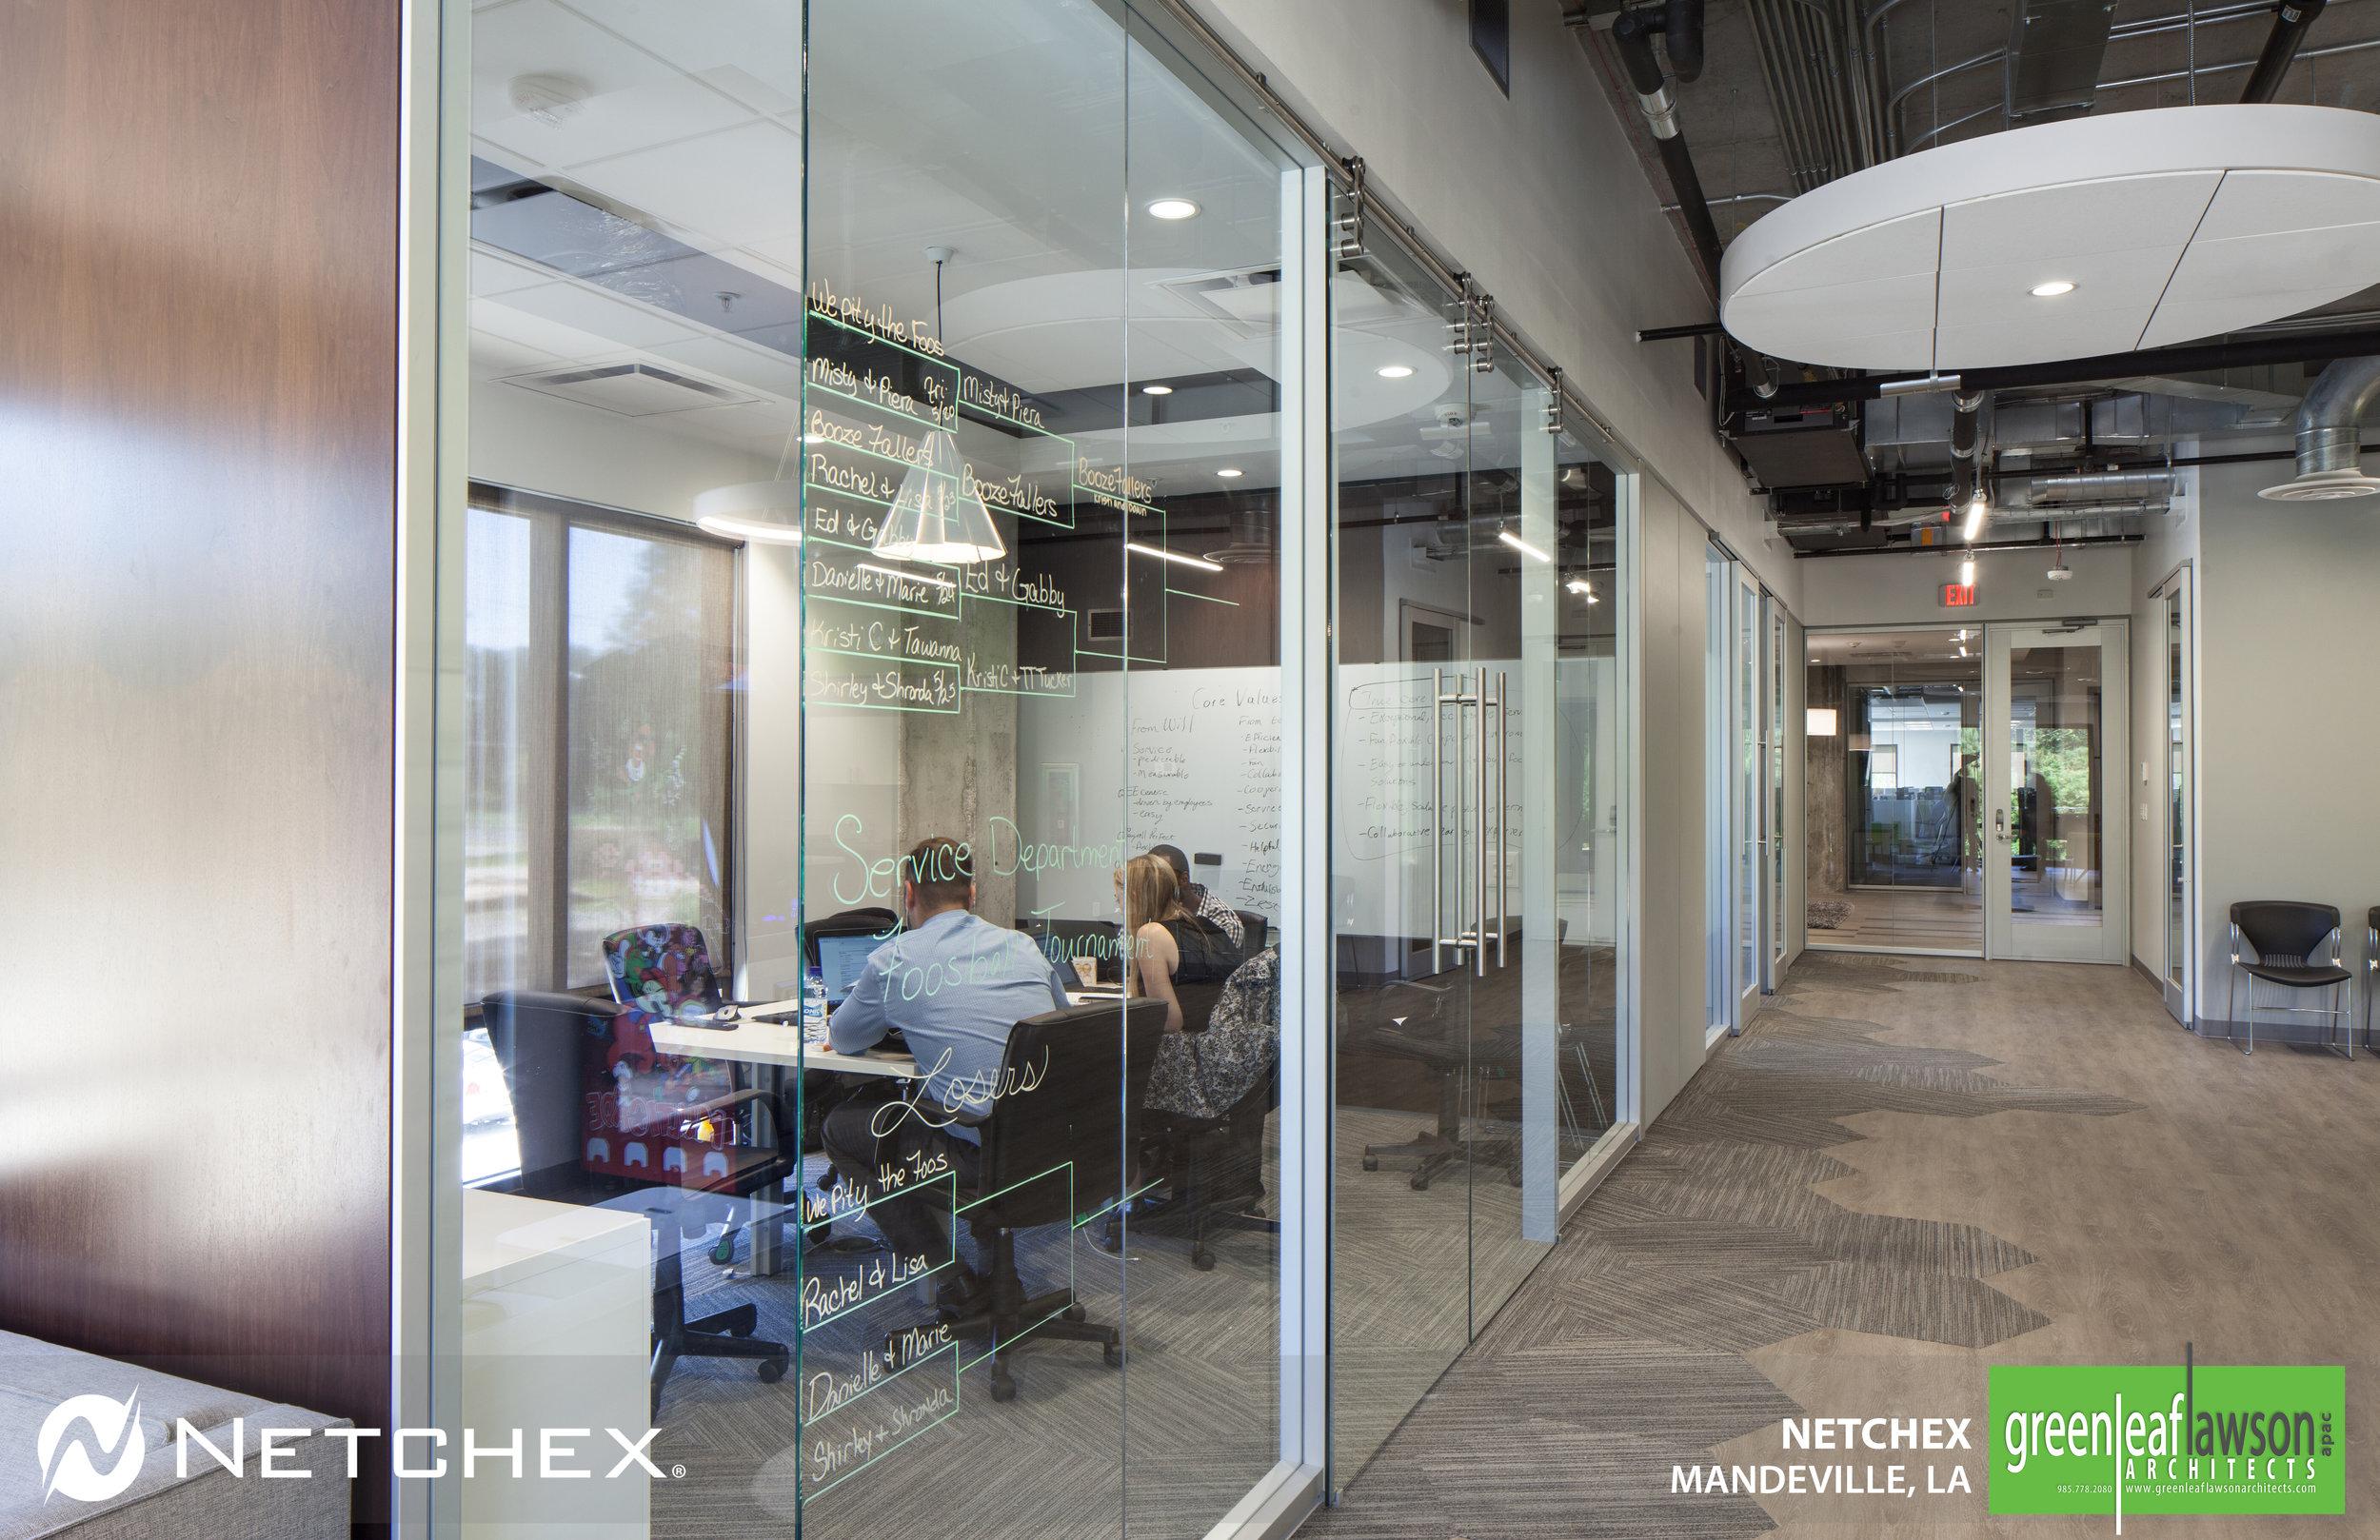 Netchex_2.jpg